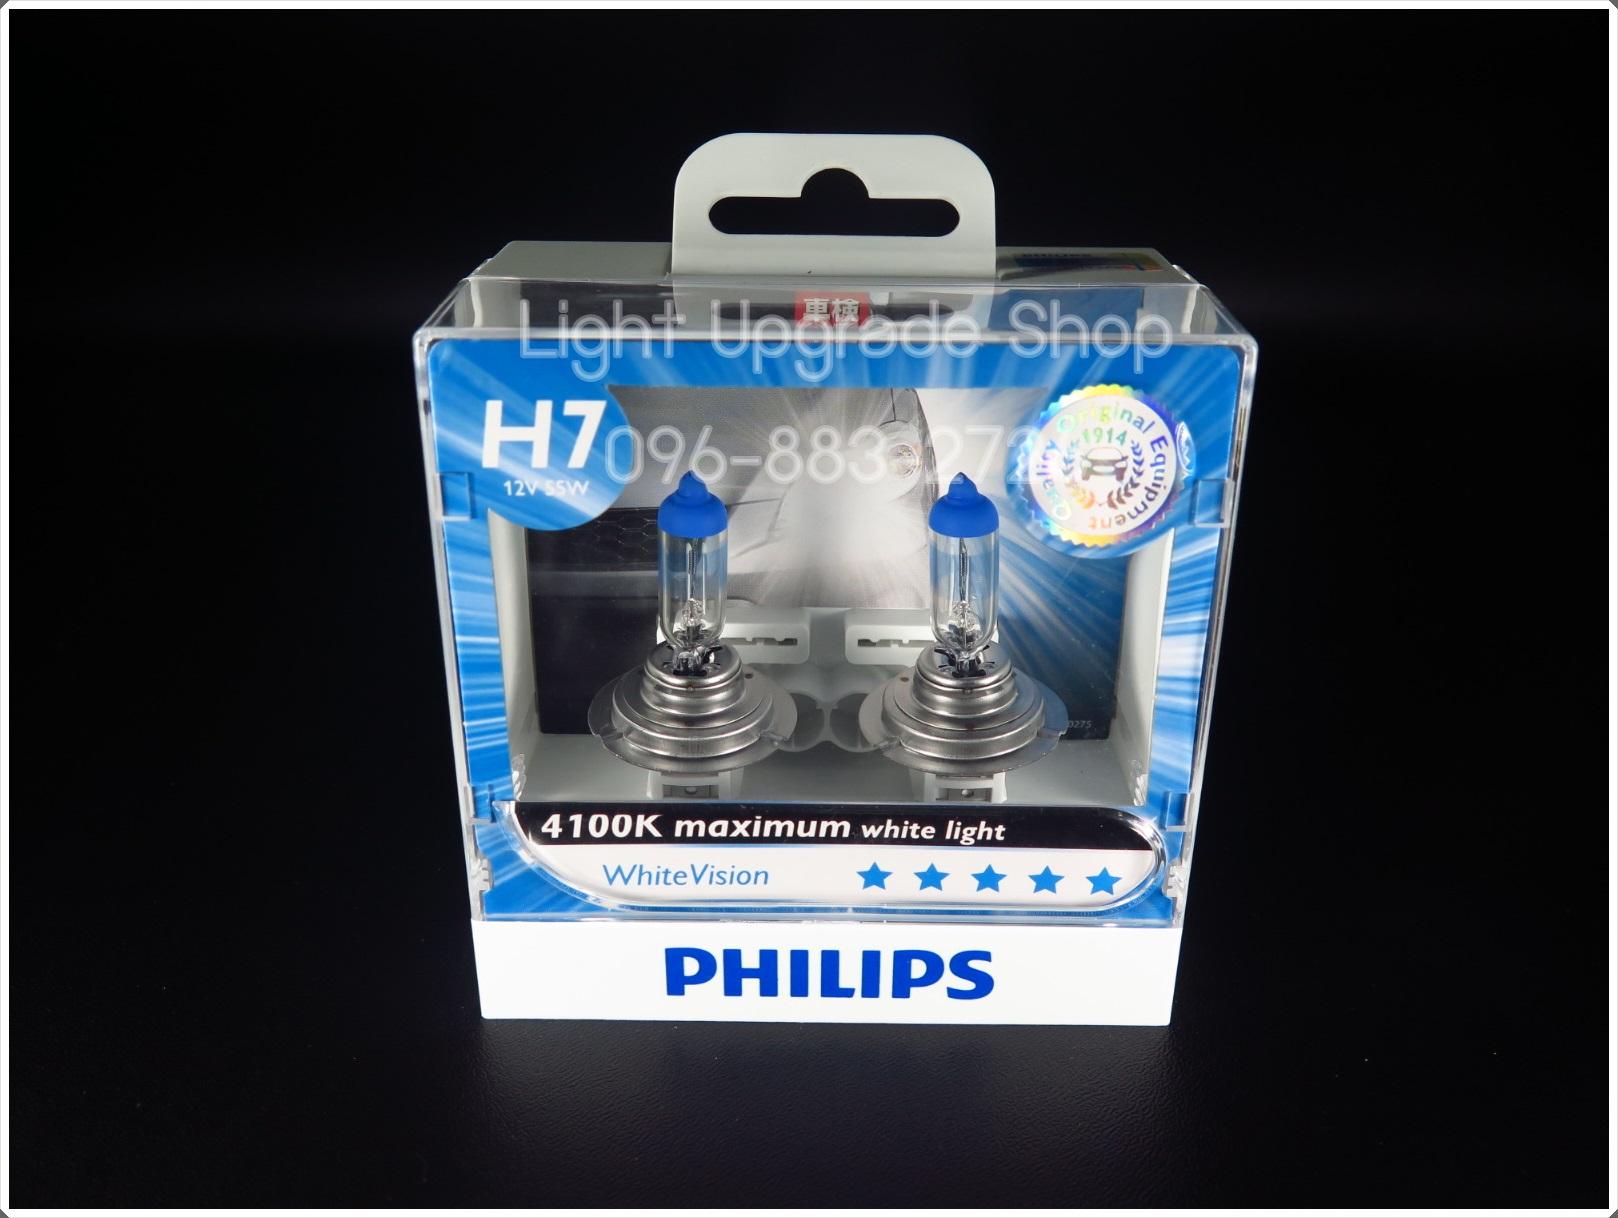 Philips White Vision 4100K [H7]